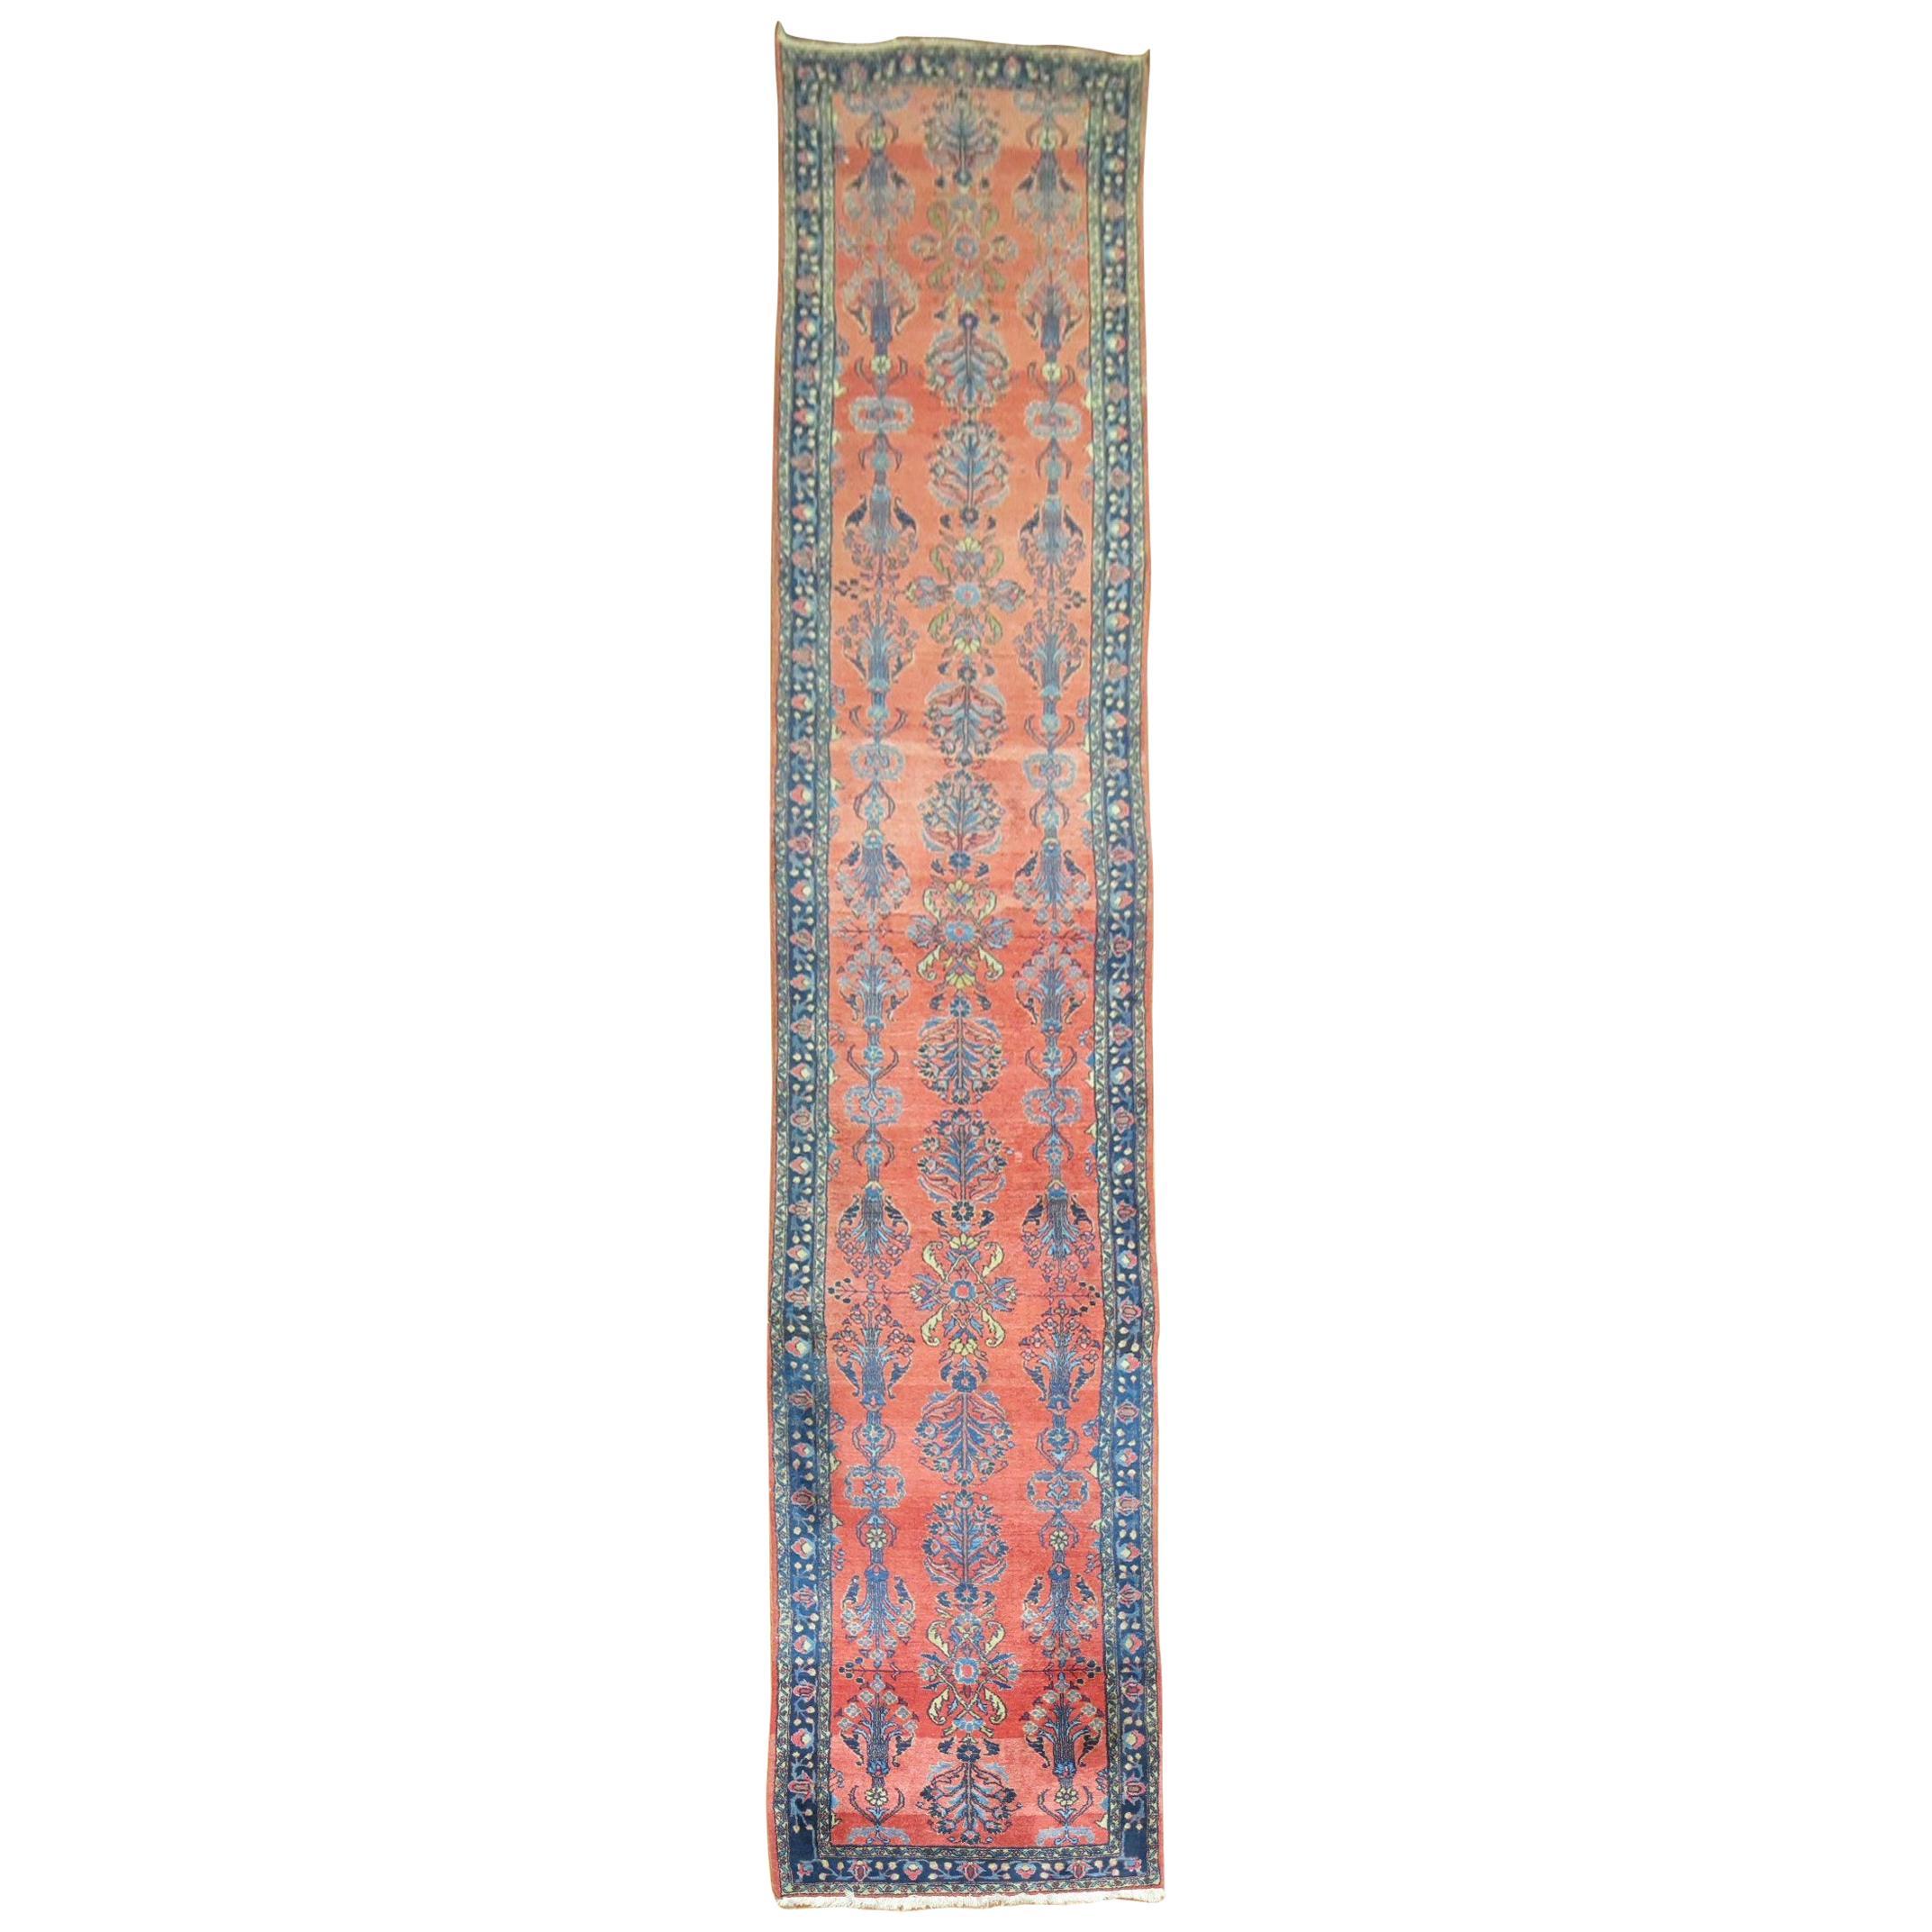 Long Traditional Antique Persian Sarouk Runner